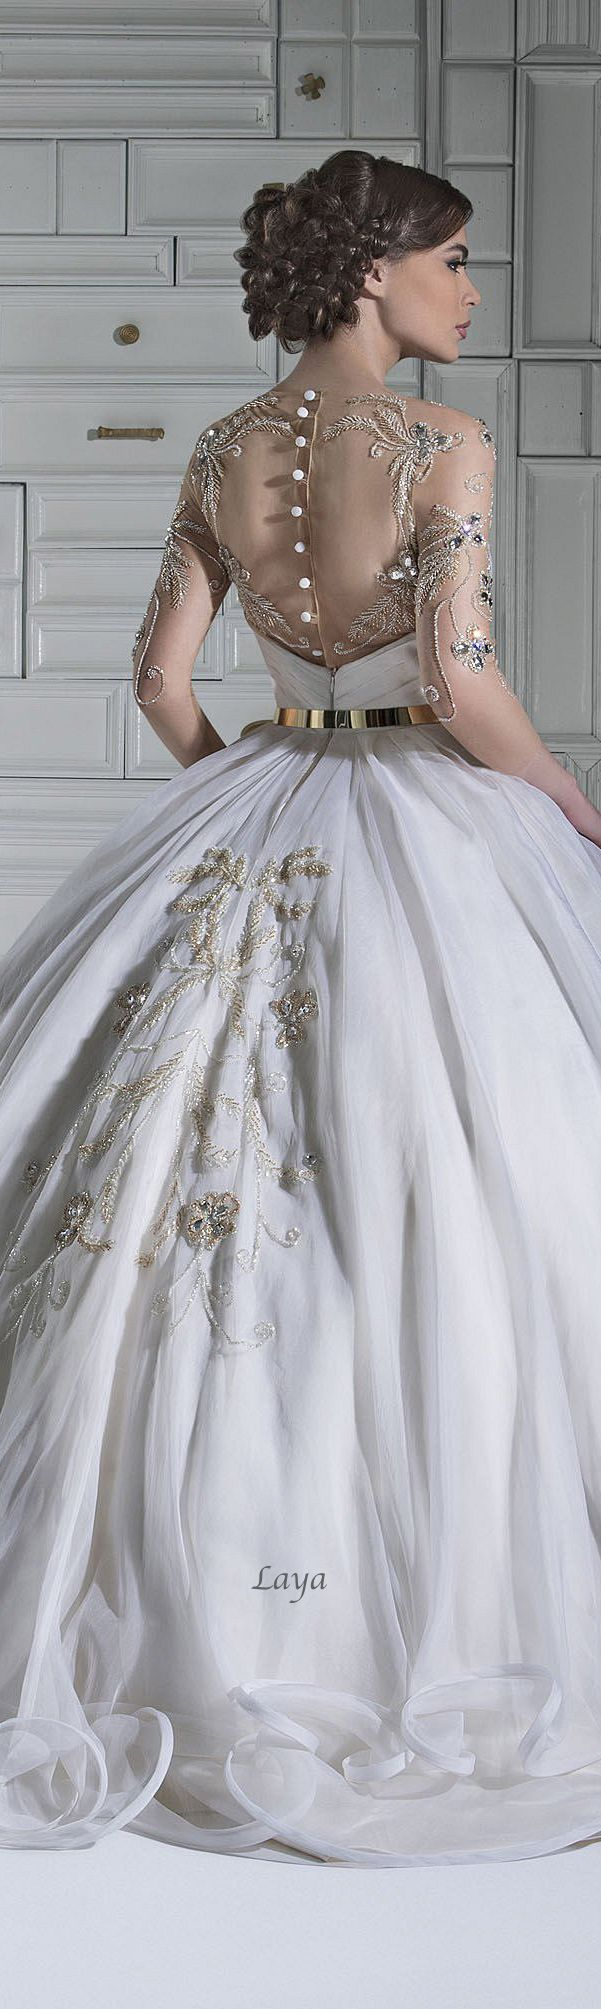 Chrystelle Atallah Wedding Dress